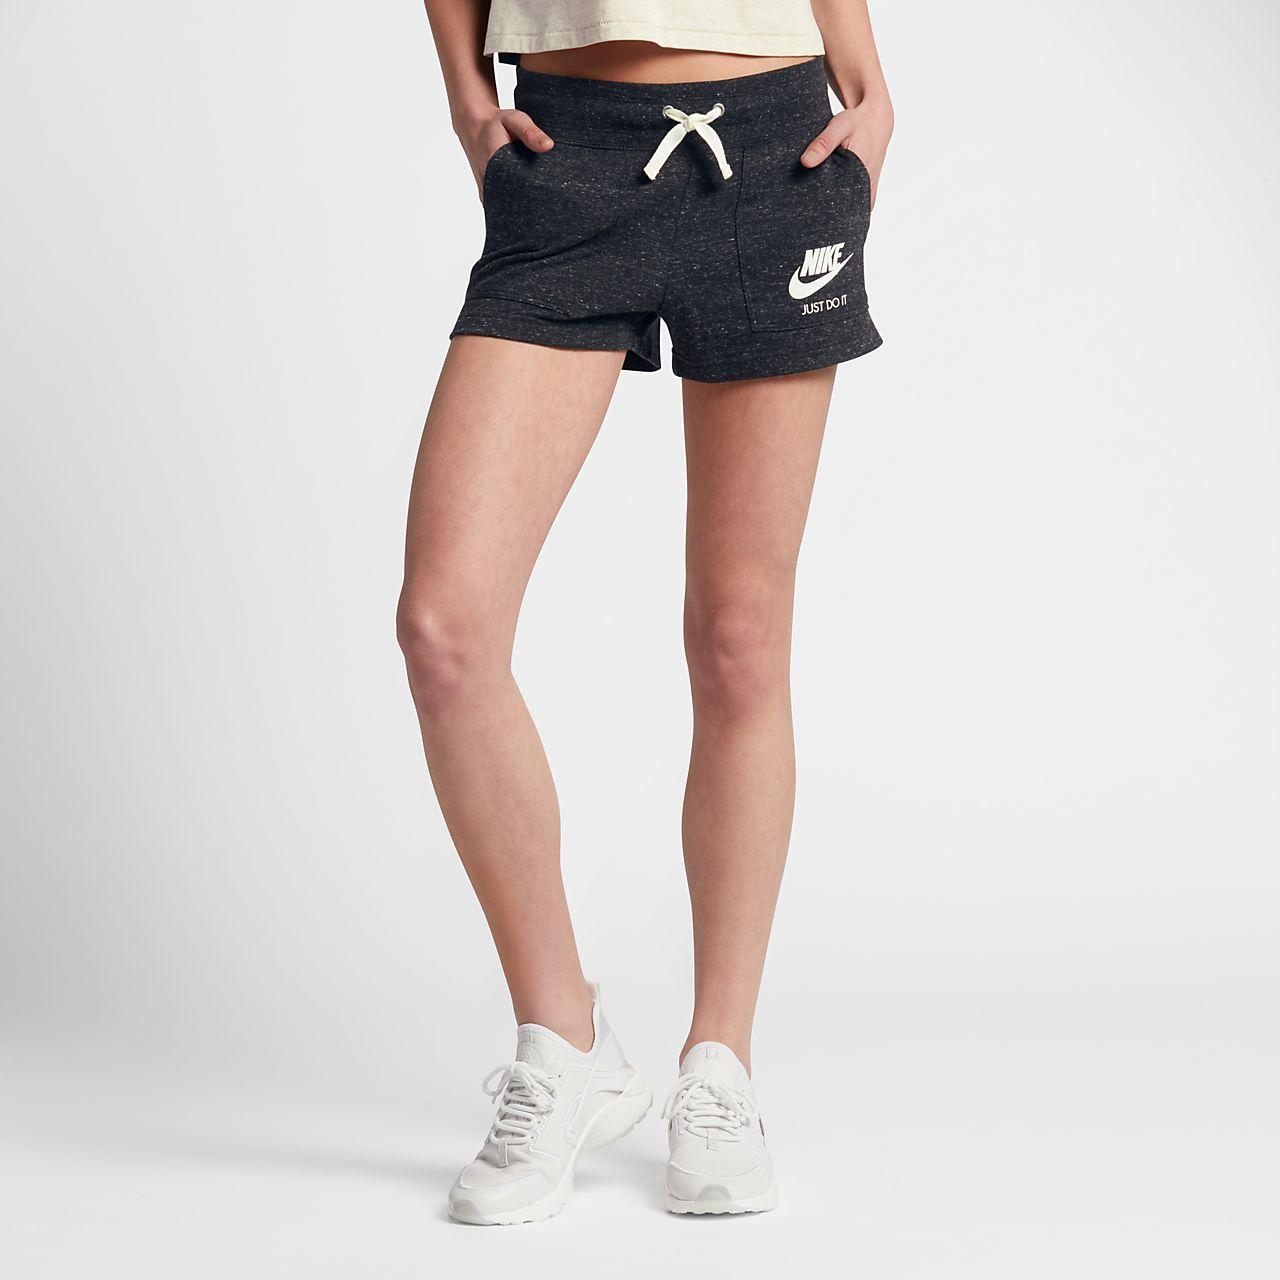 4168a861e2300 Nike Sportswear Gym Vintage Women s Shorts. Nike.com